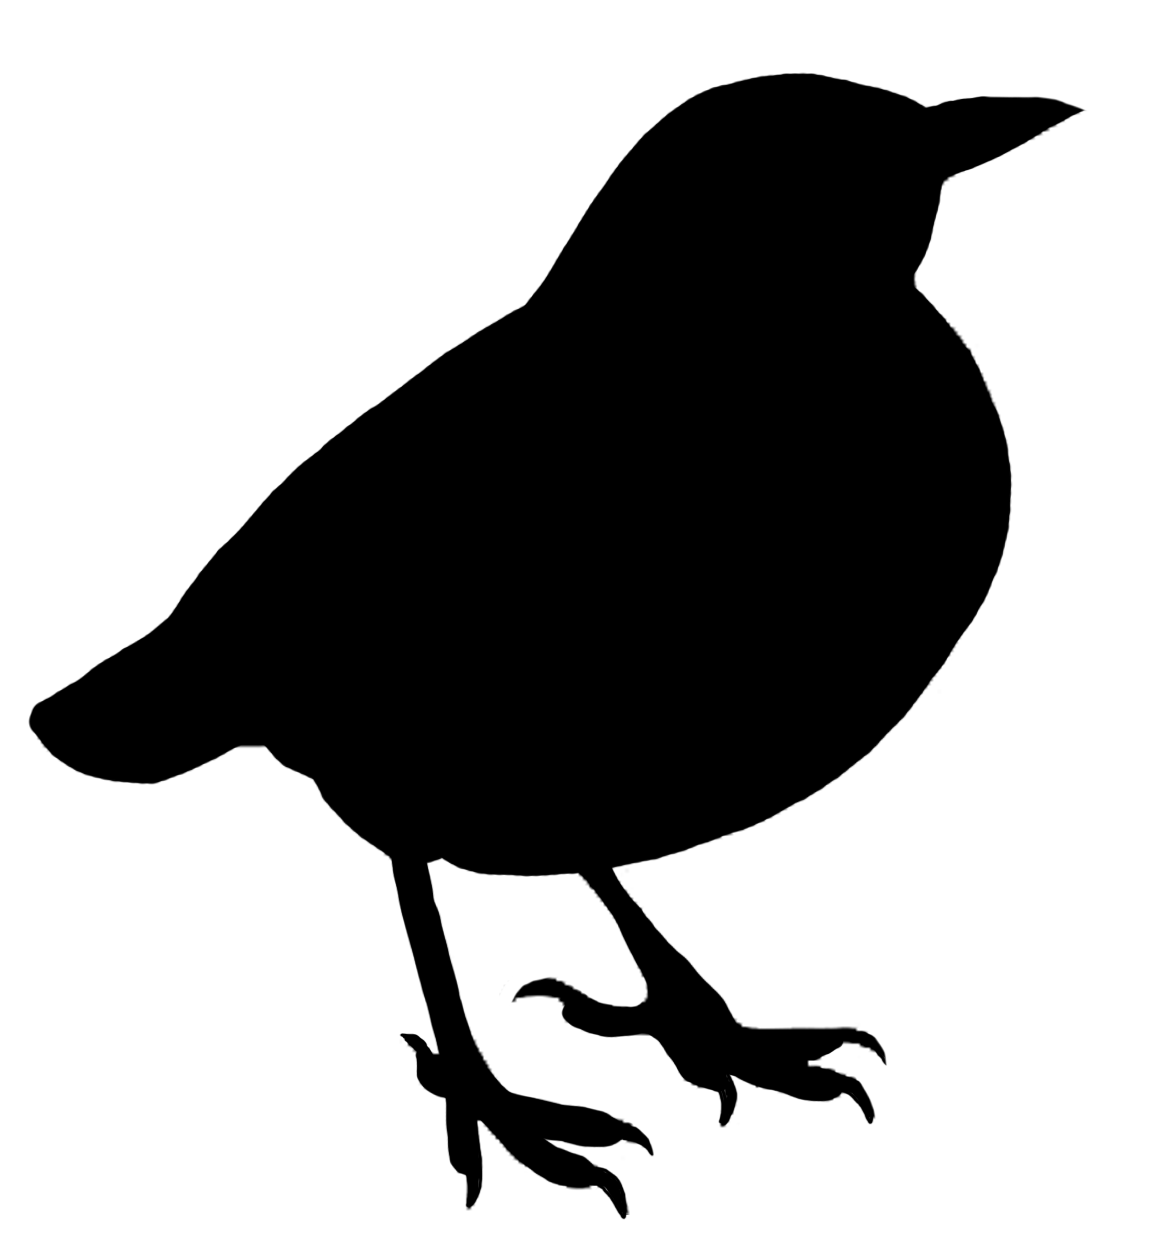 Bird Outline PNG HD - 127205